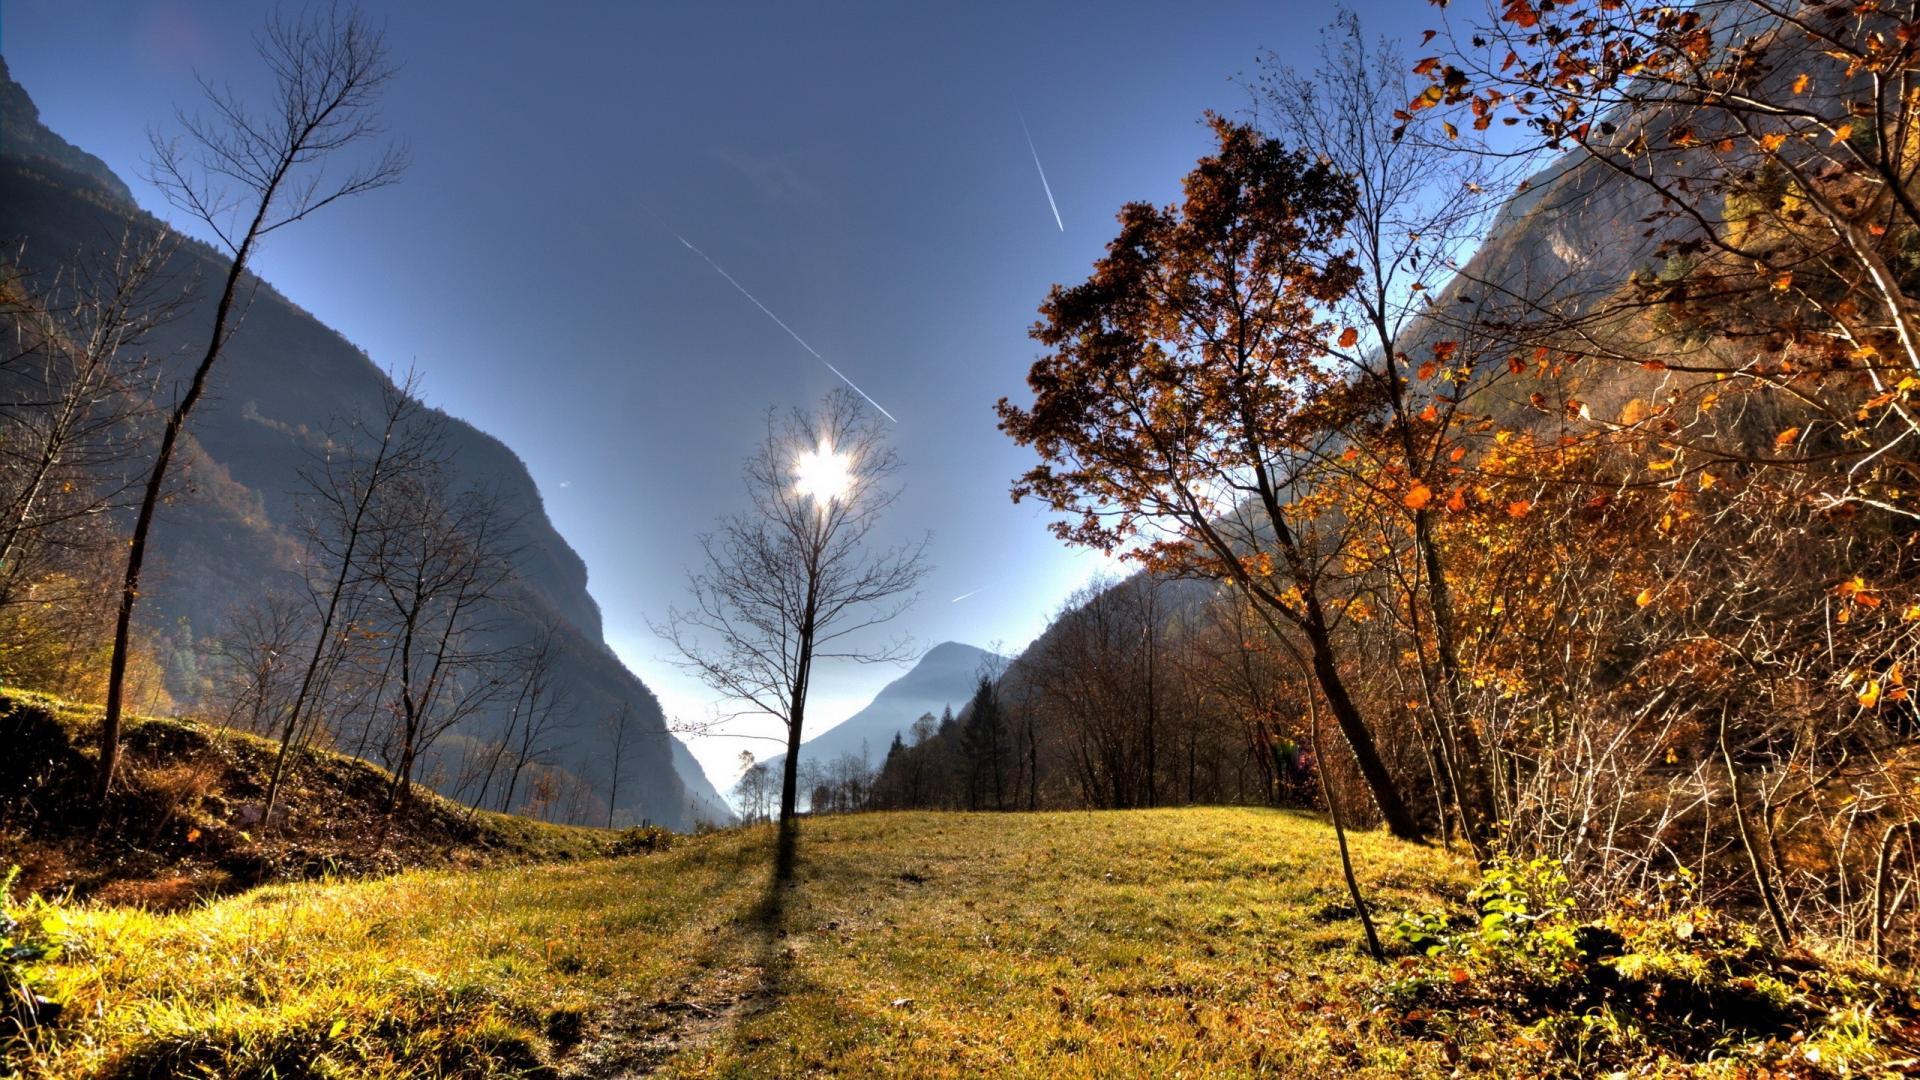 autumn wallpaper hd 1366x768